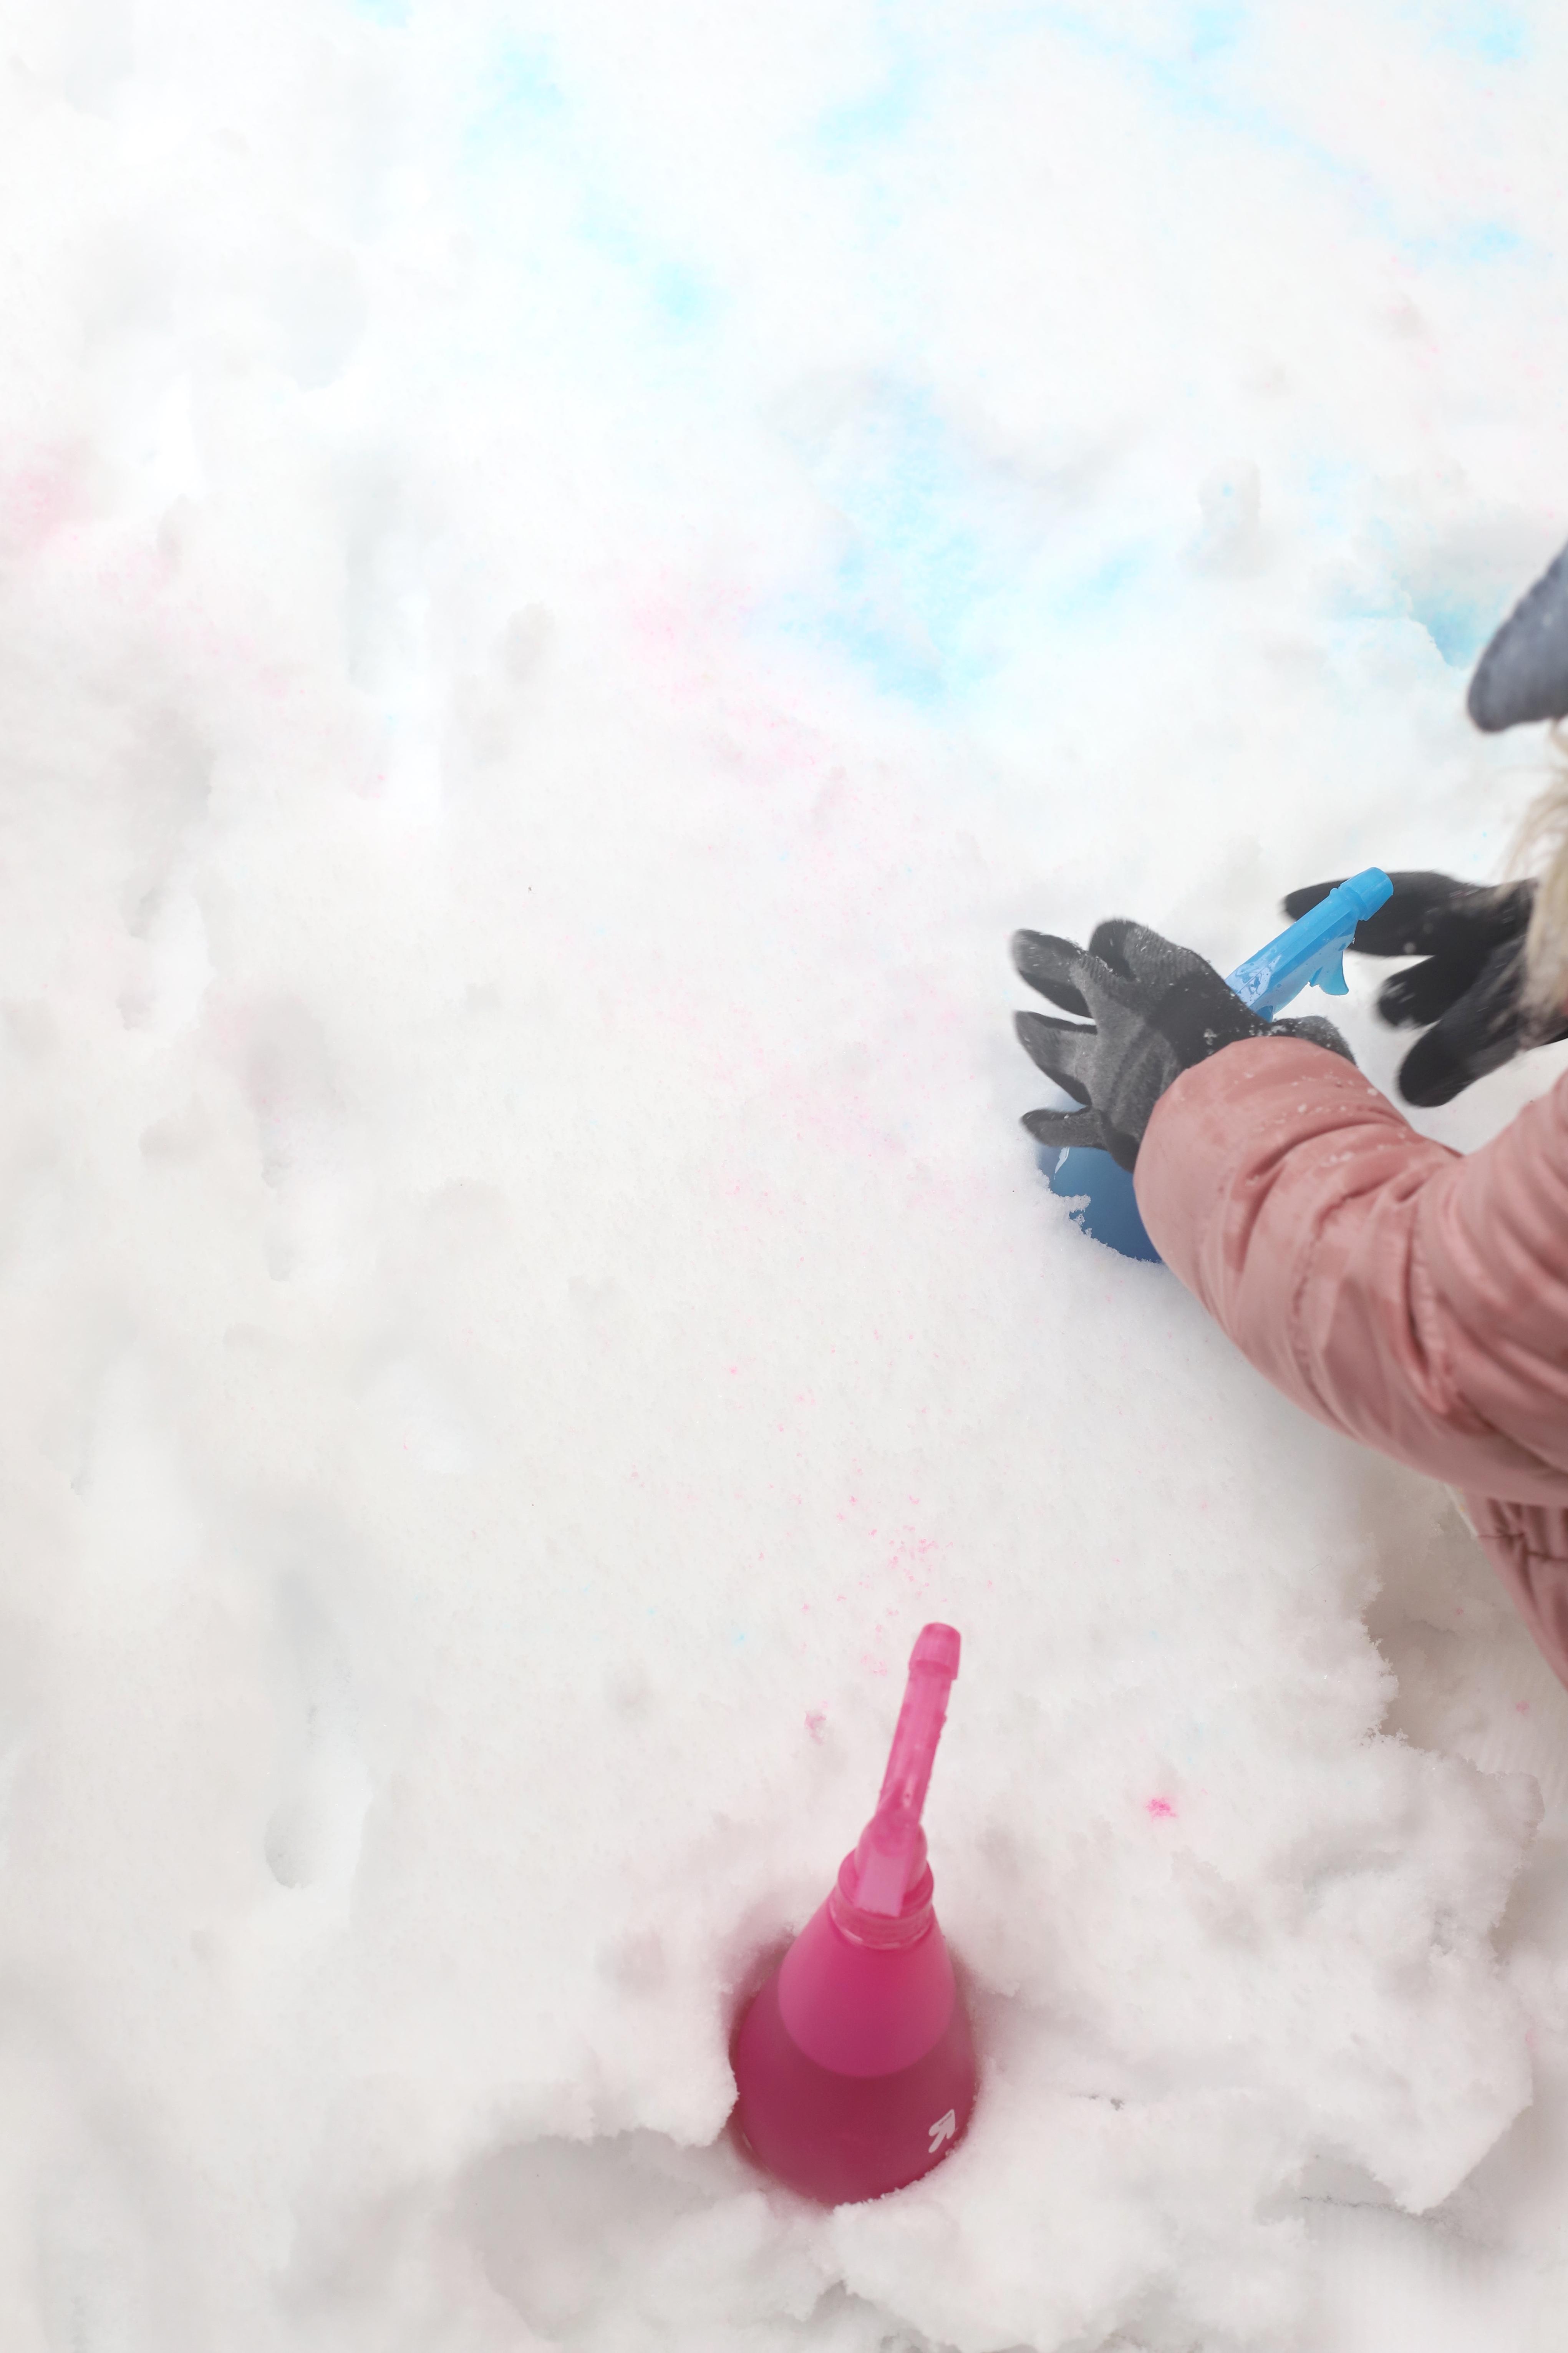 Color Bath Drops. #snowpaint #snowday #snowactivities #snowfun #howtopaintsnow #snowspraypaint | glitterinc.com | @glitterinc